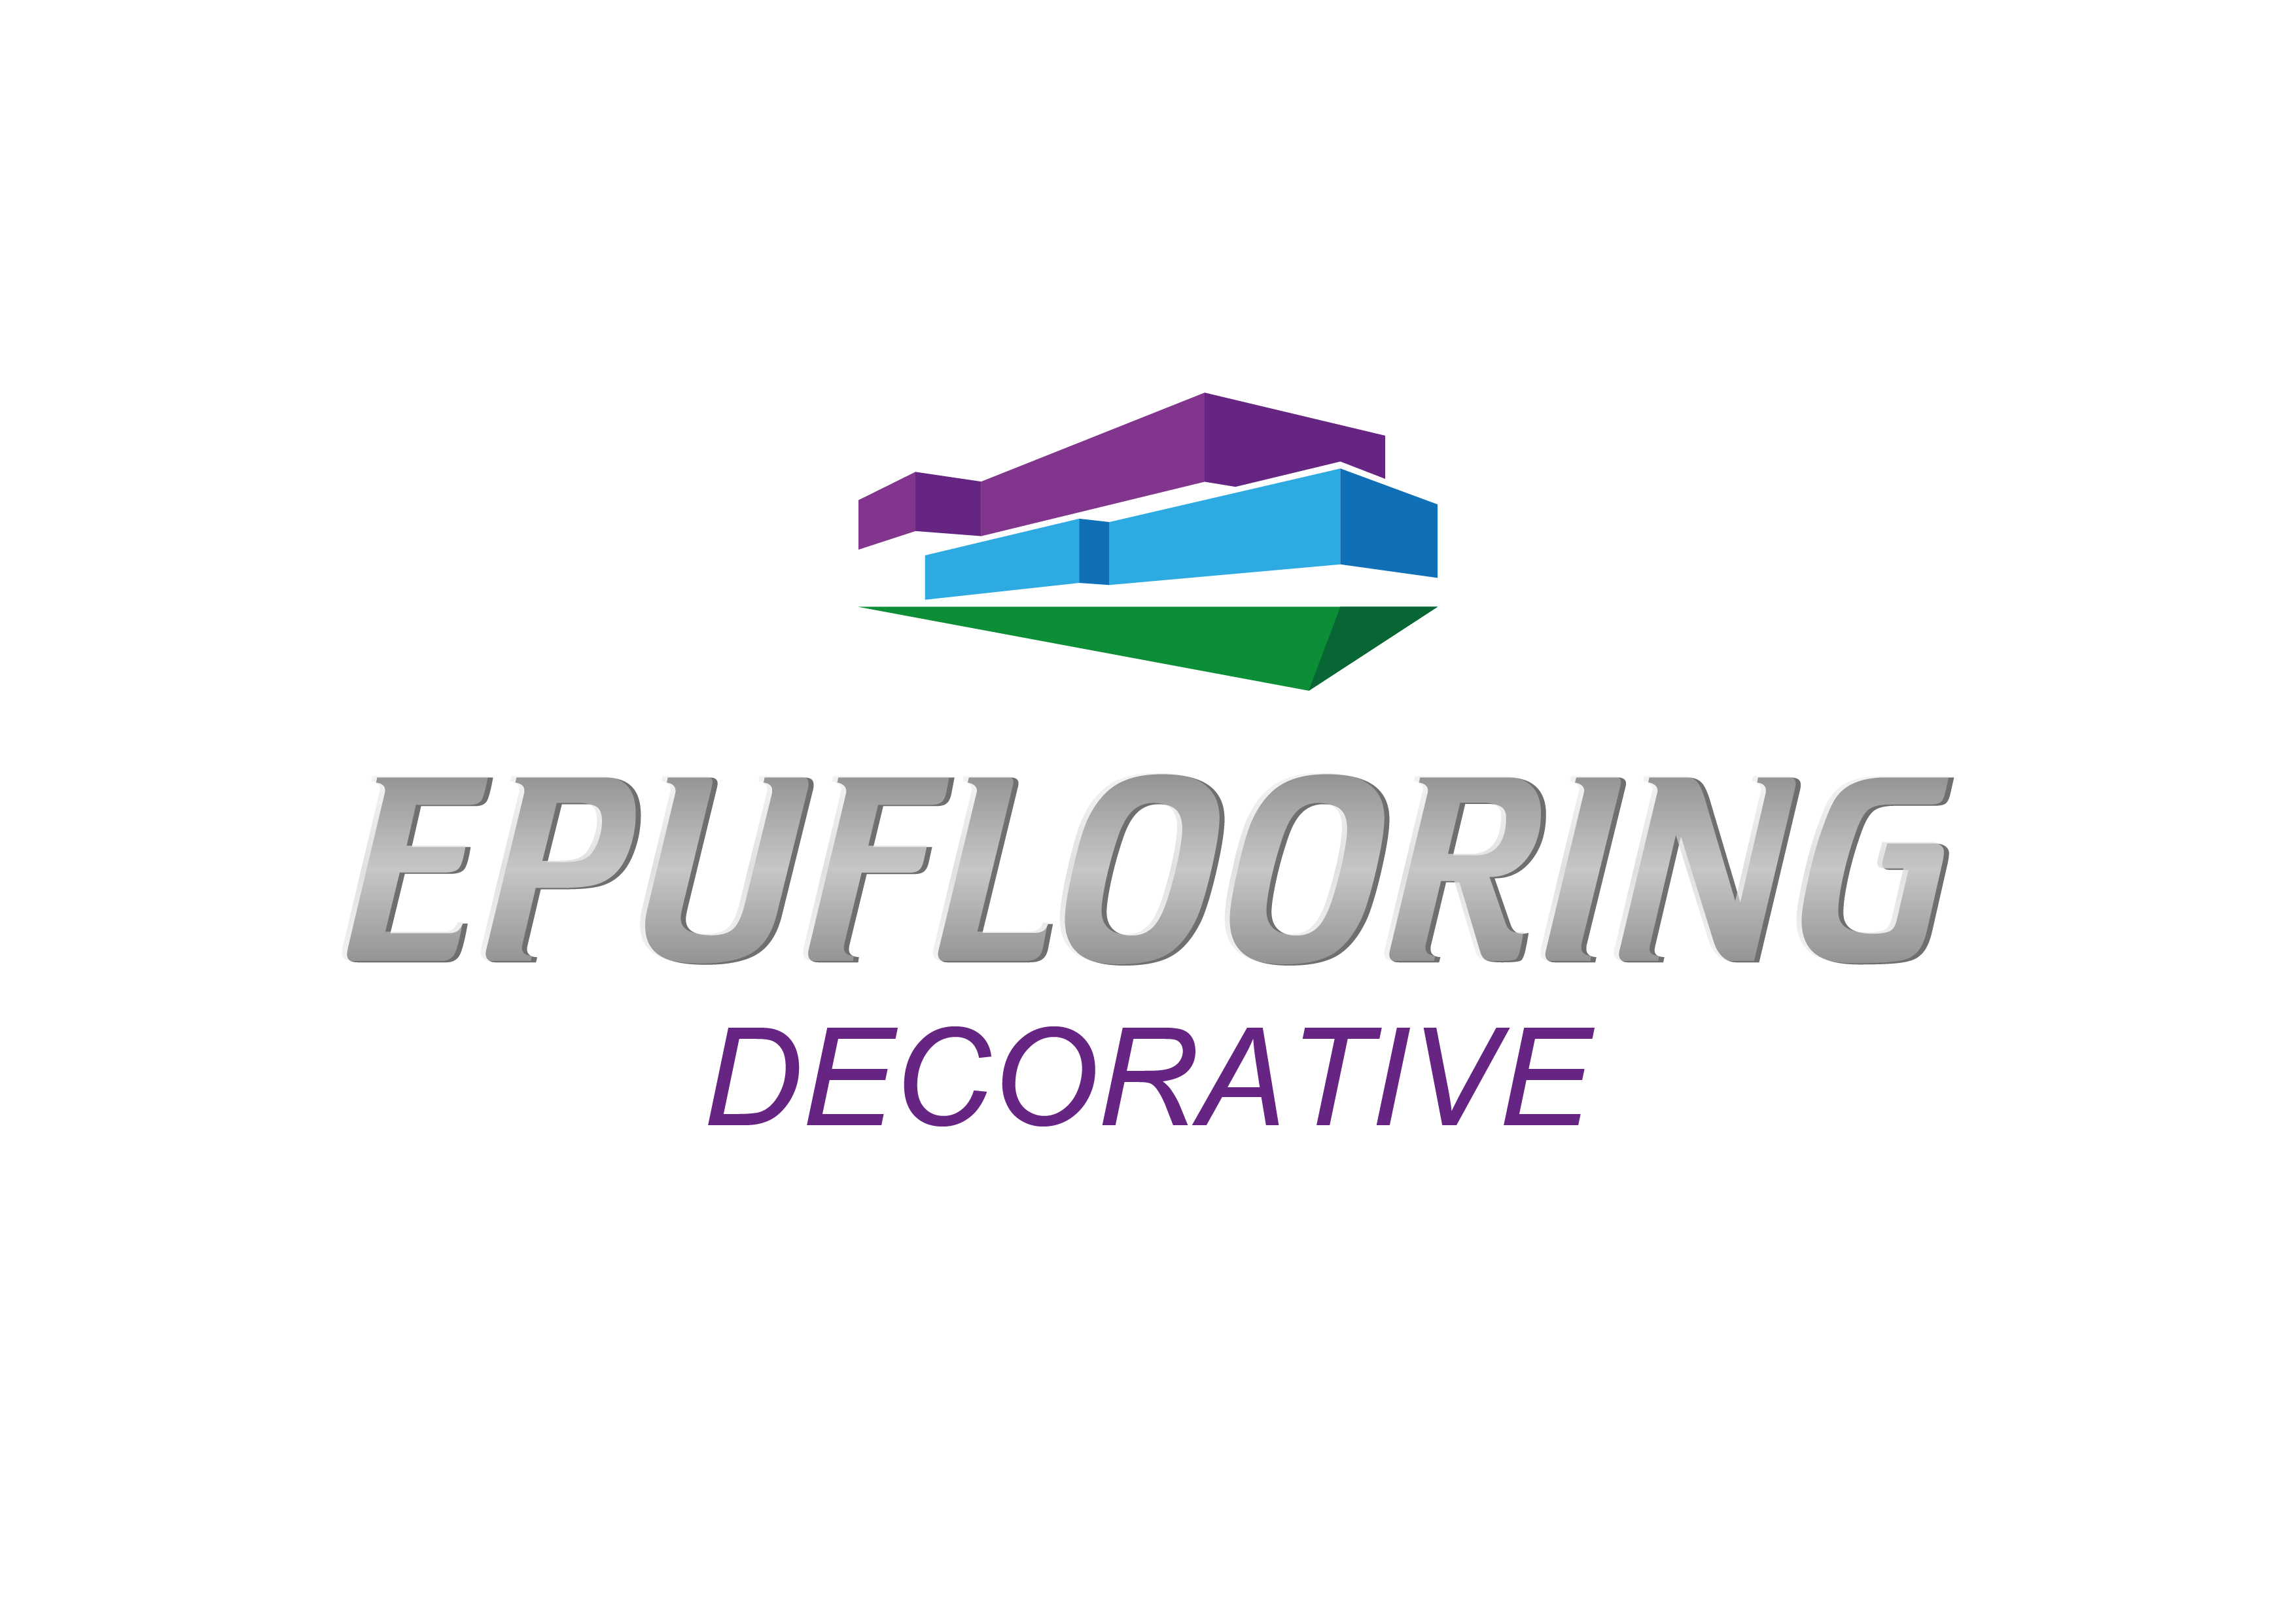 EPUFLOORING GROUP LOGO decorative